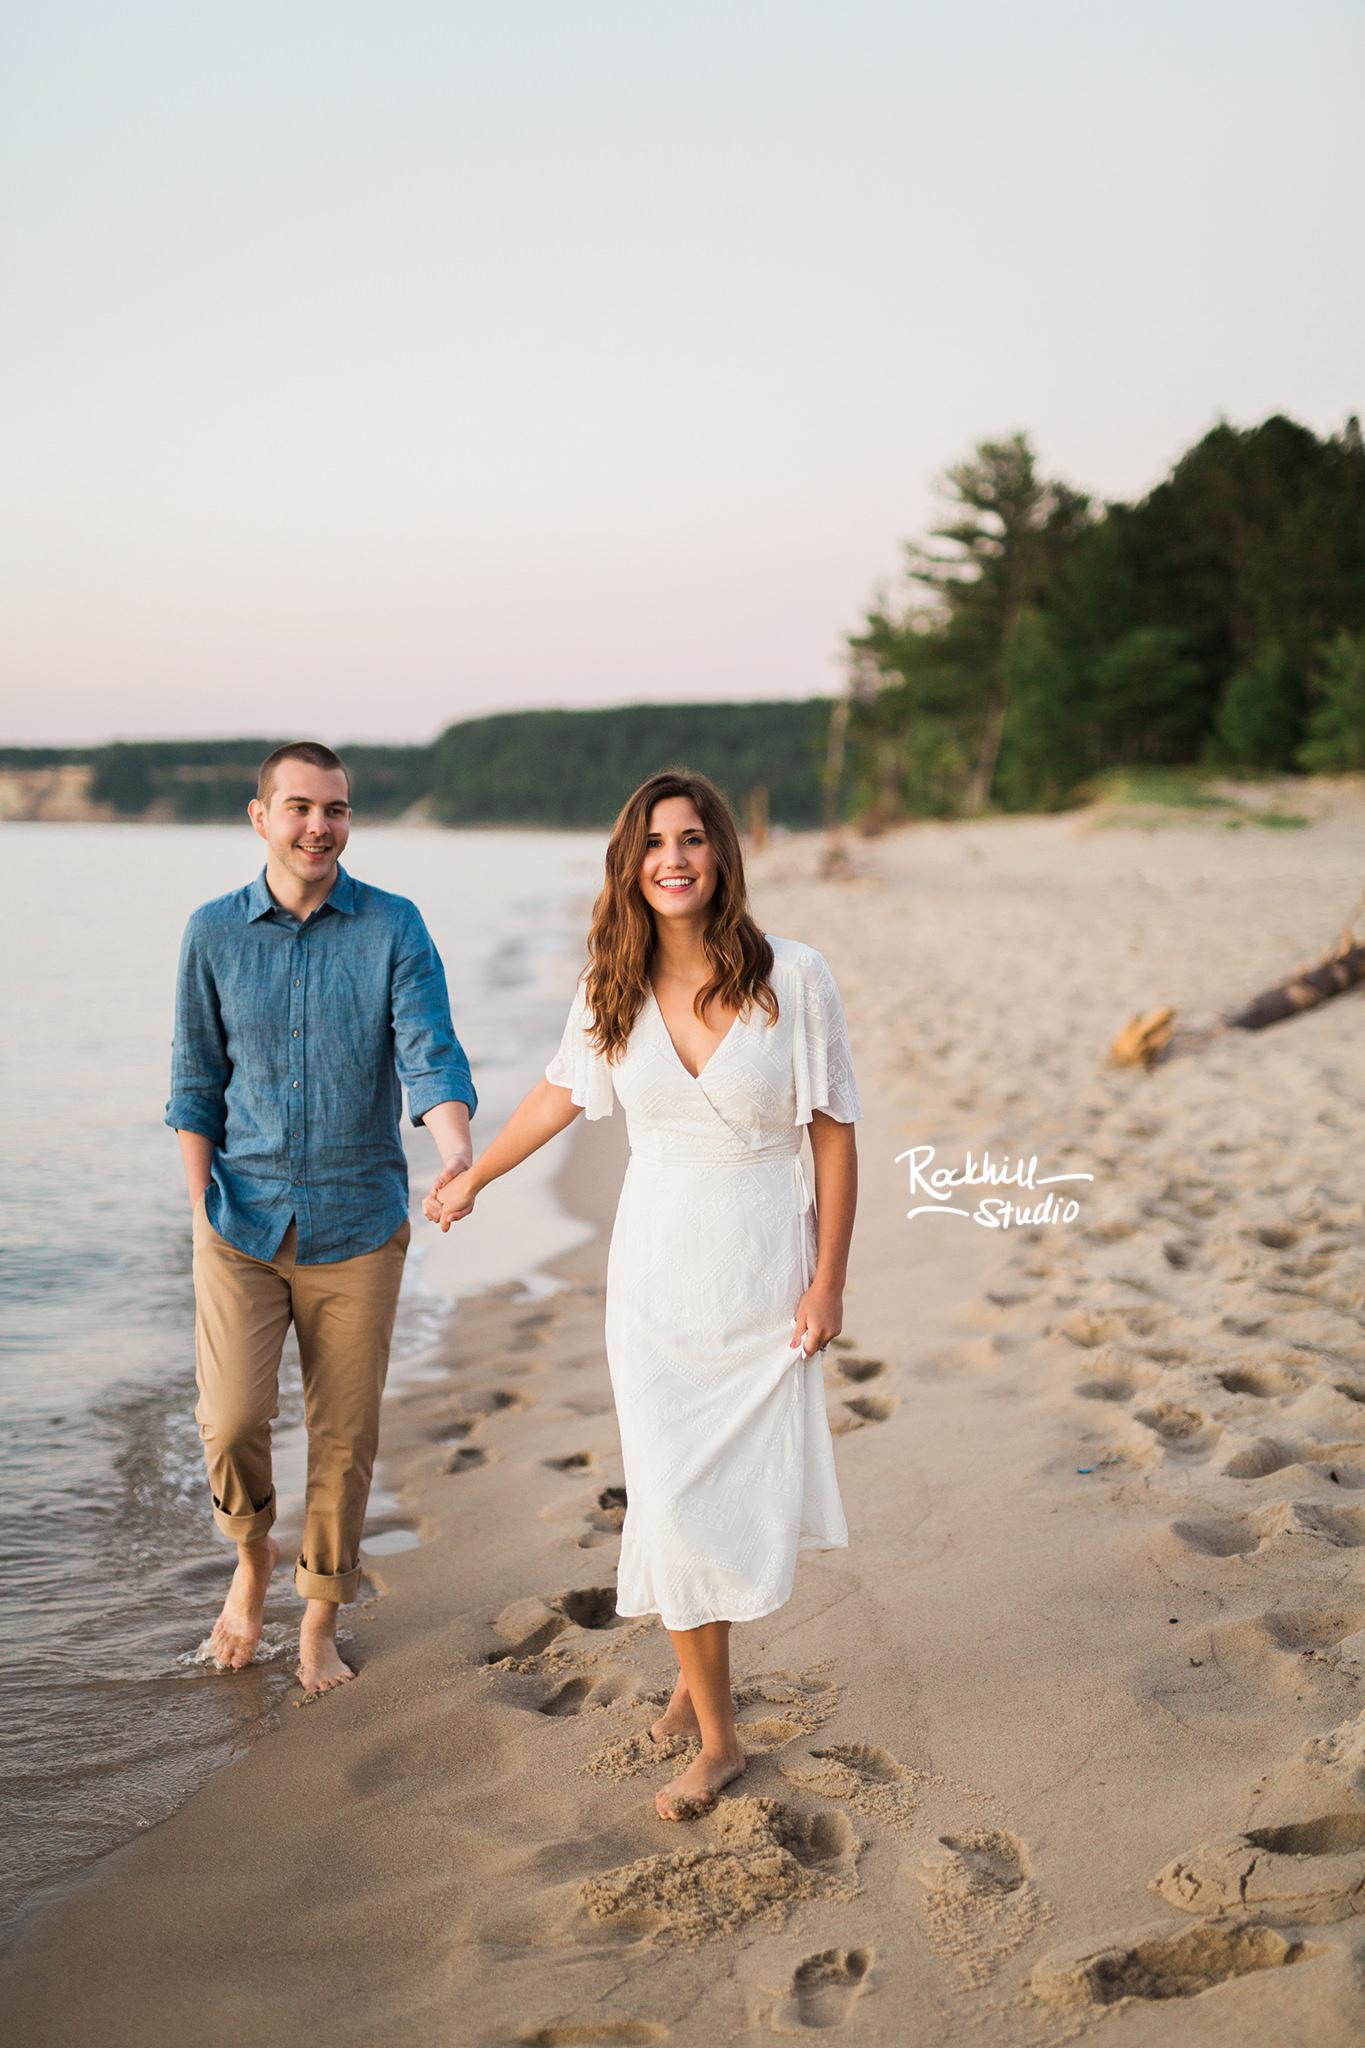 Northern Michigan engagement, pictured rocks miners beach, traverse city wedding photographer Rockhill Studio